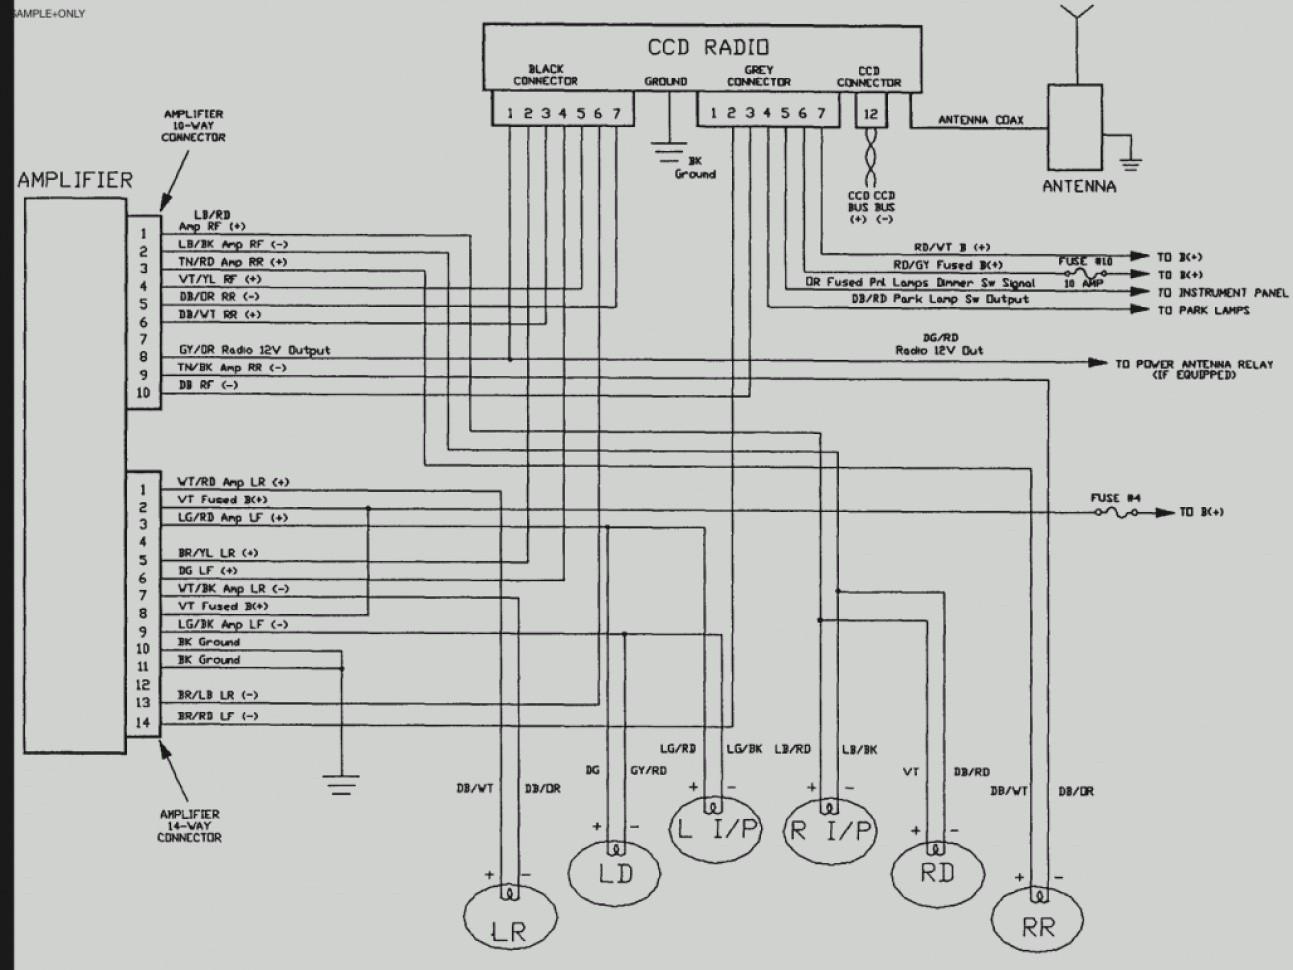 [DHAV_9290]  2014 Jeep Wrangler Radio Wiring Harness 1981 Buick G Body Ecm Wiring Diagram  - gelumbang.the-damboel-11.florimunt.fr   2007 Jeep Commander Radio Wiring Diagram      Wiring Diagram and Schematics